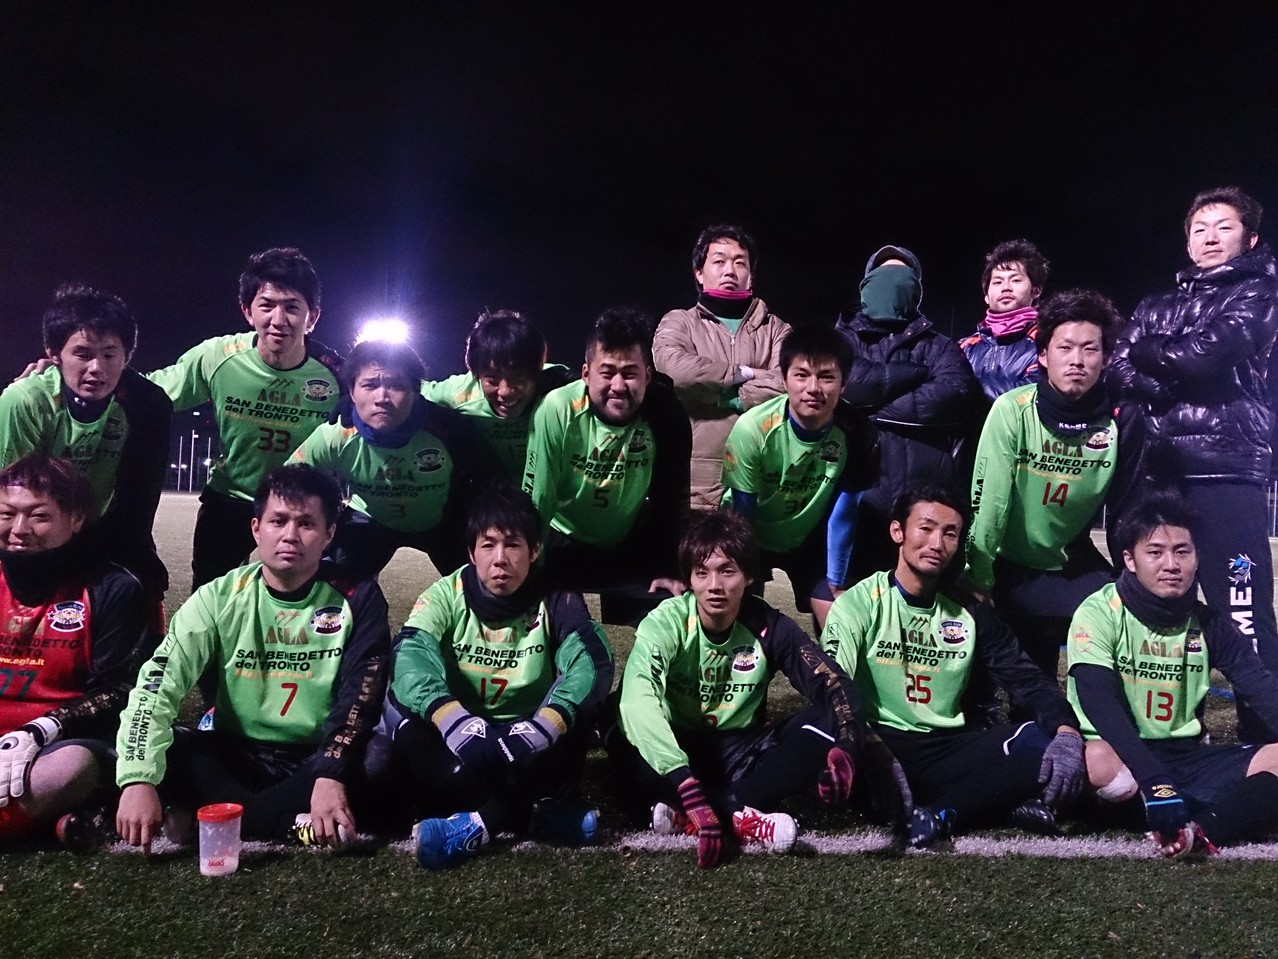 2013/12/15 J-GREEN堺 vs 紀北蹴球団